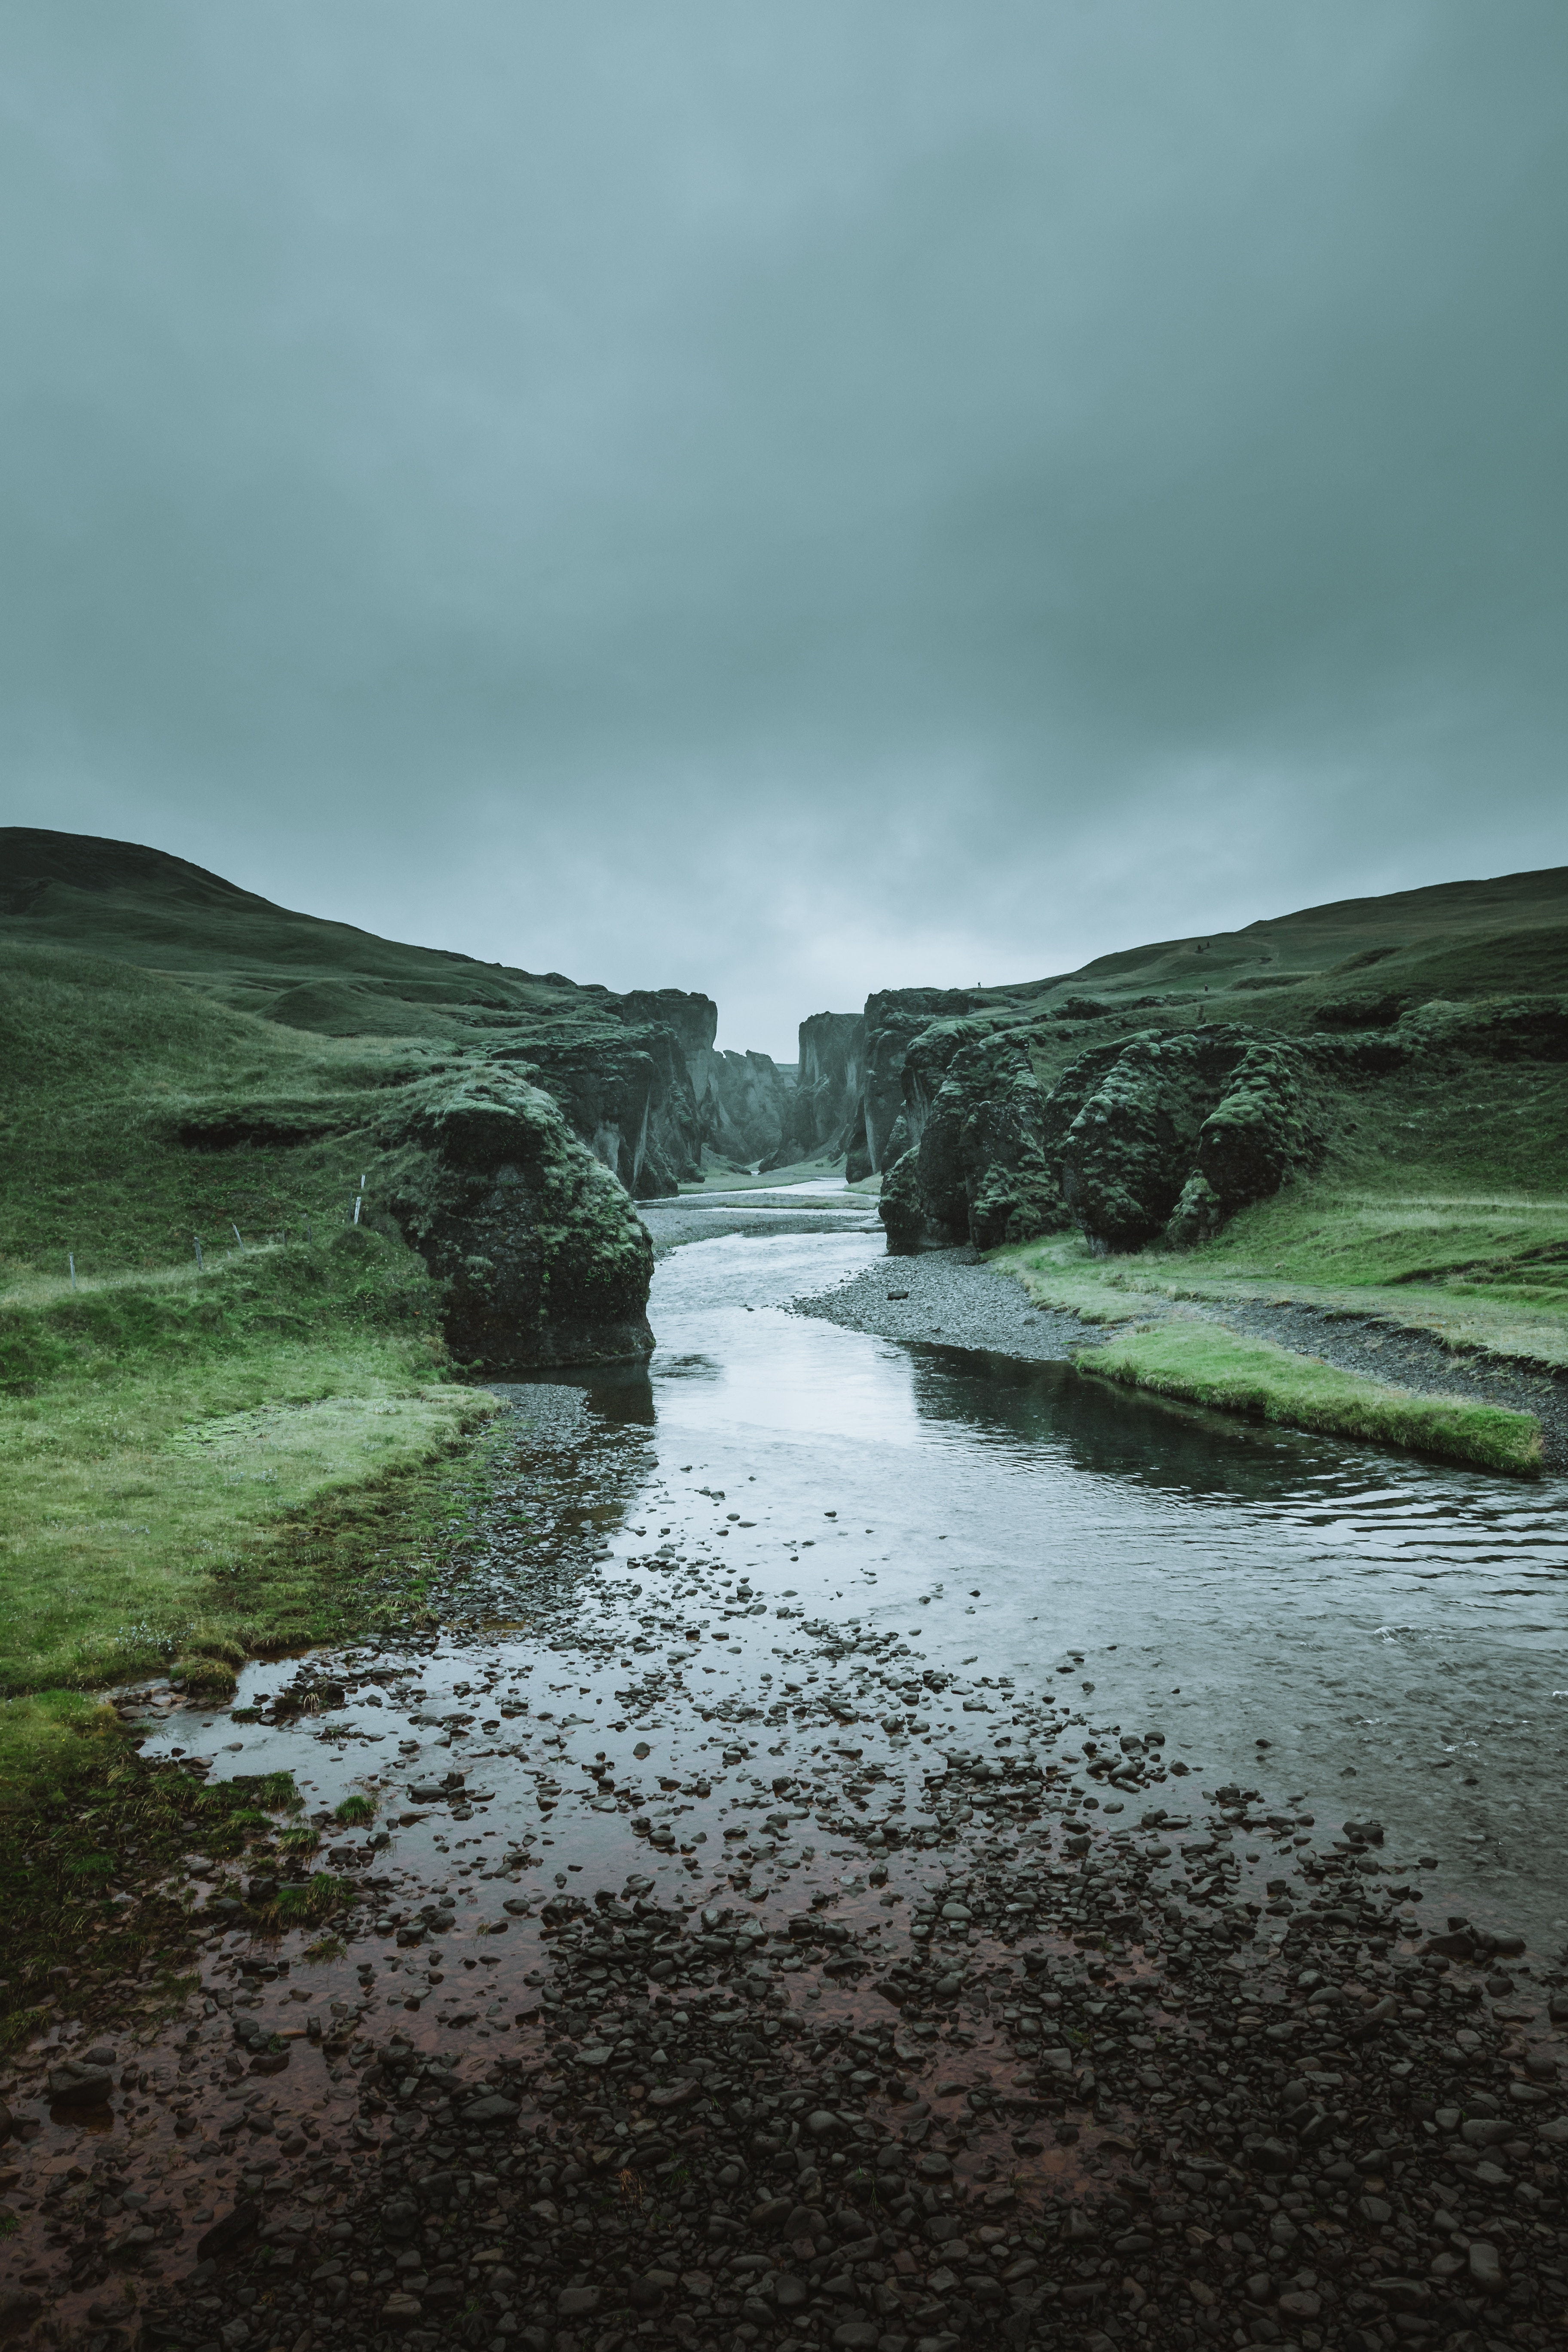 River Stream Coast Steep Stony Ditch   Faroe Islands Wallpaper 3648x5472